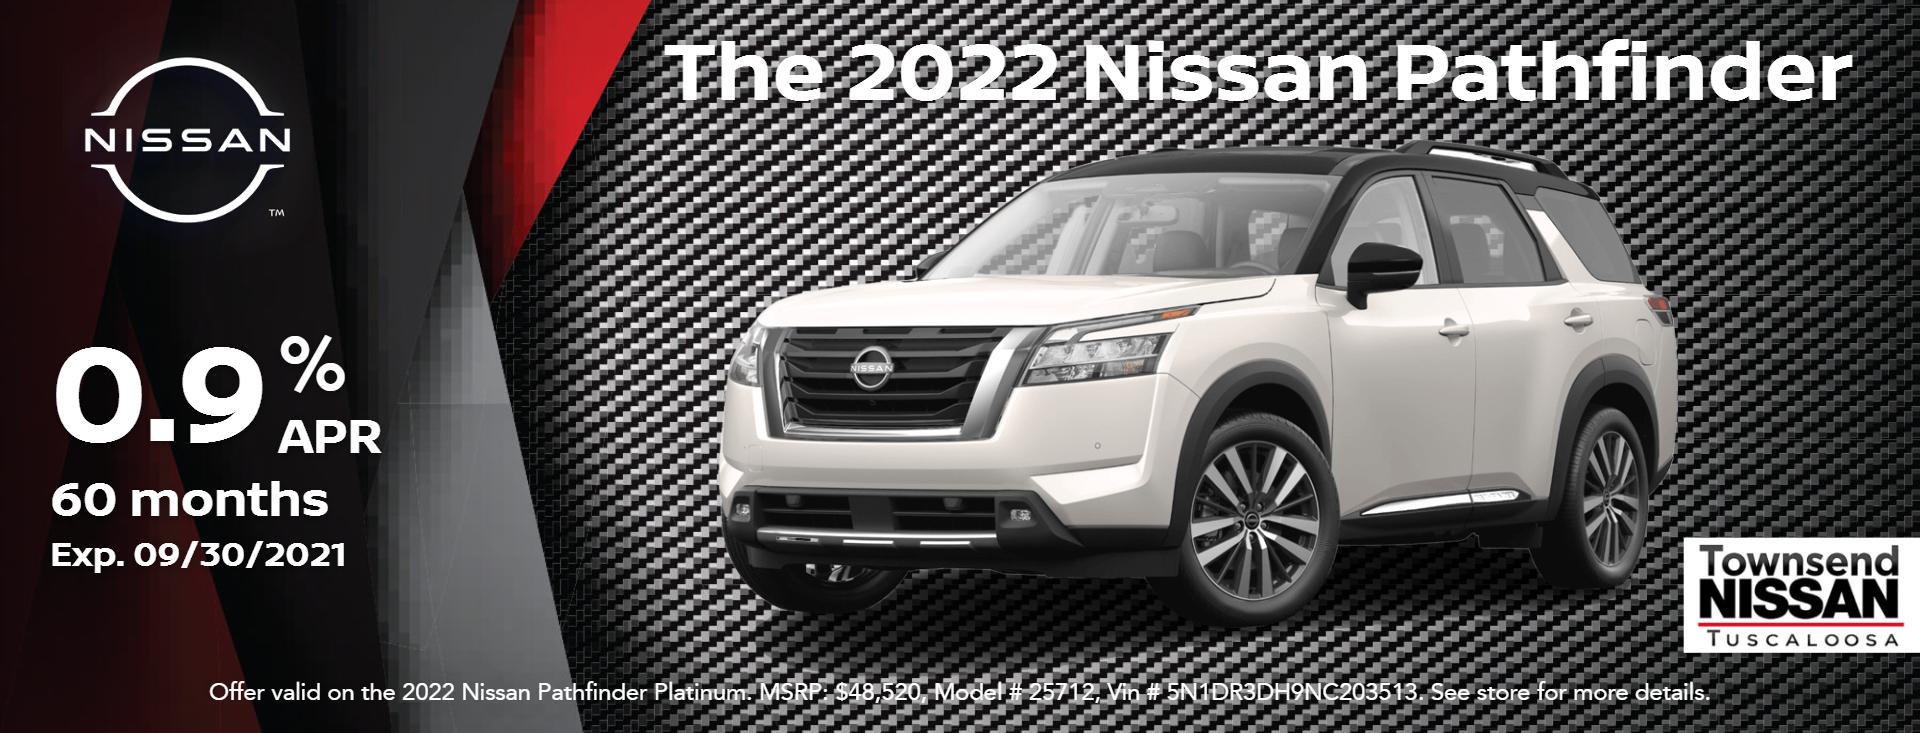 2022_Nissan_Pathfinder_Platinum 2WD_Tue Sep 14 2021 16_13_38 GMT-0500 (Central Daylight Time)